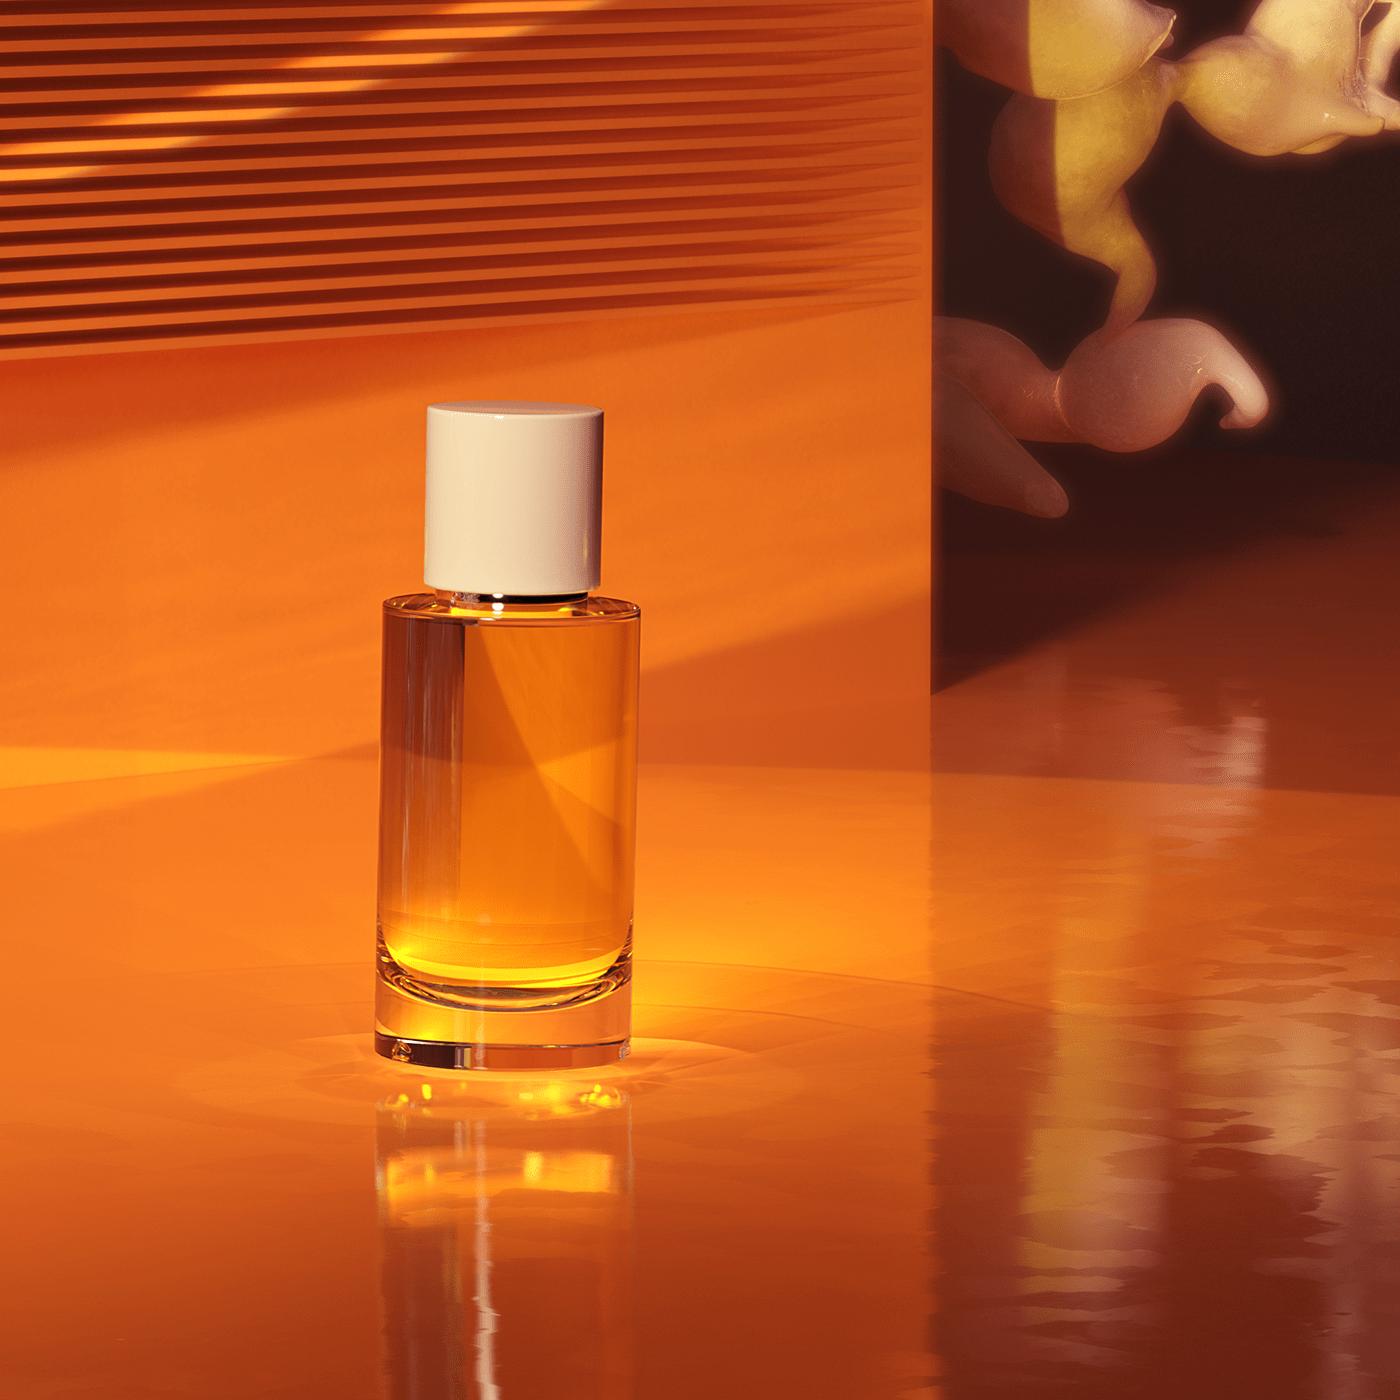 beauty bottle perfume redshift teaser Theatre 歌舞伎